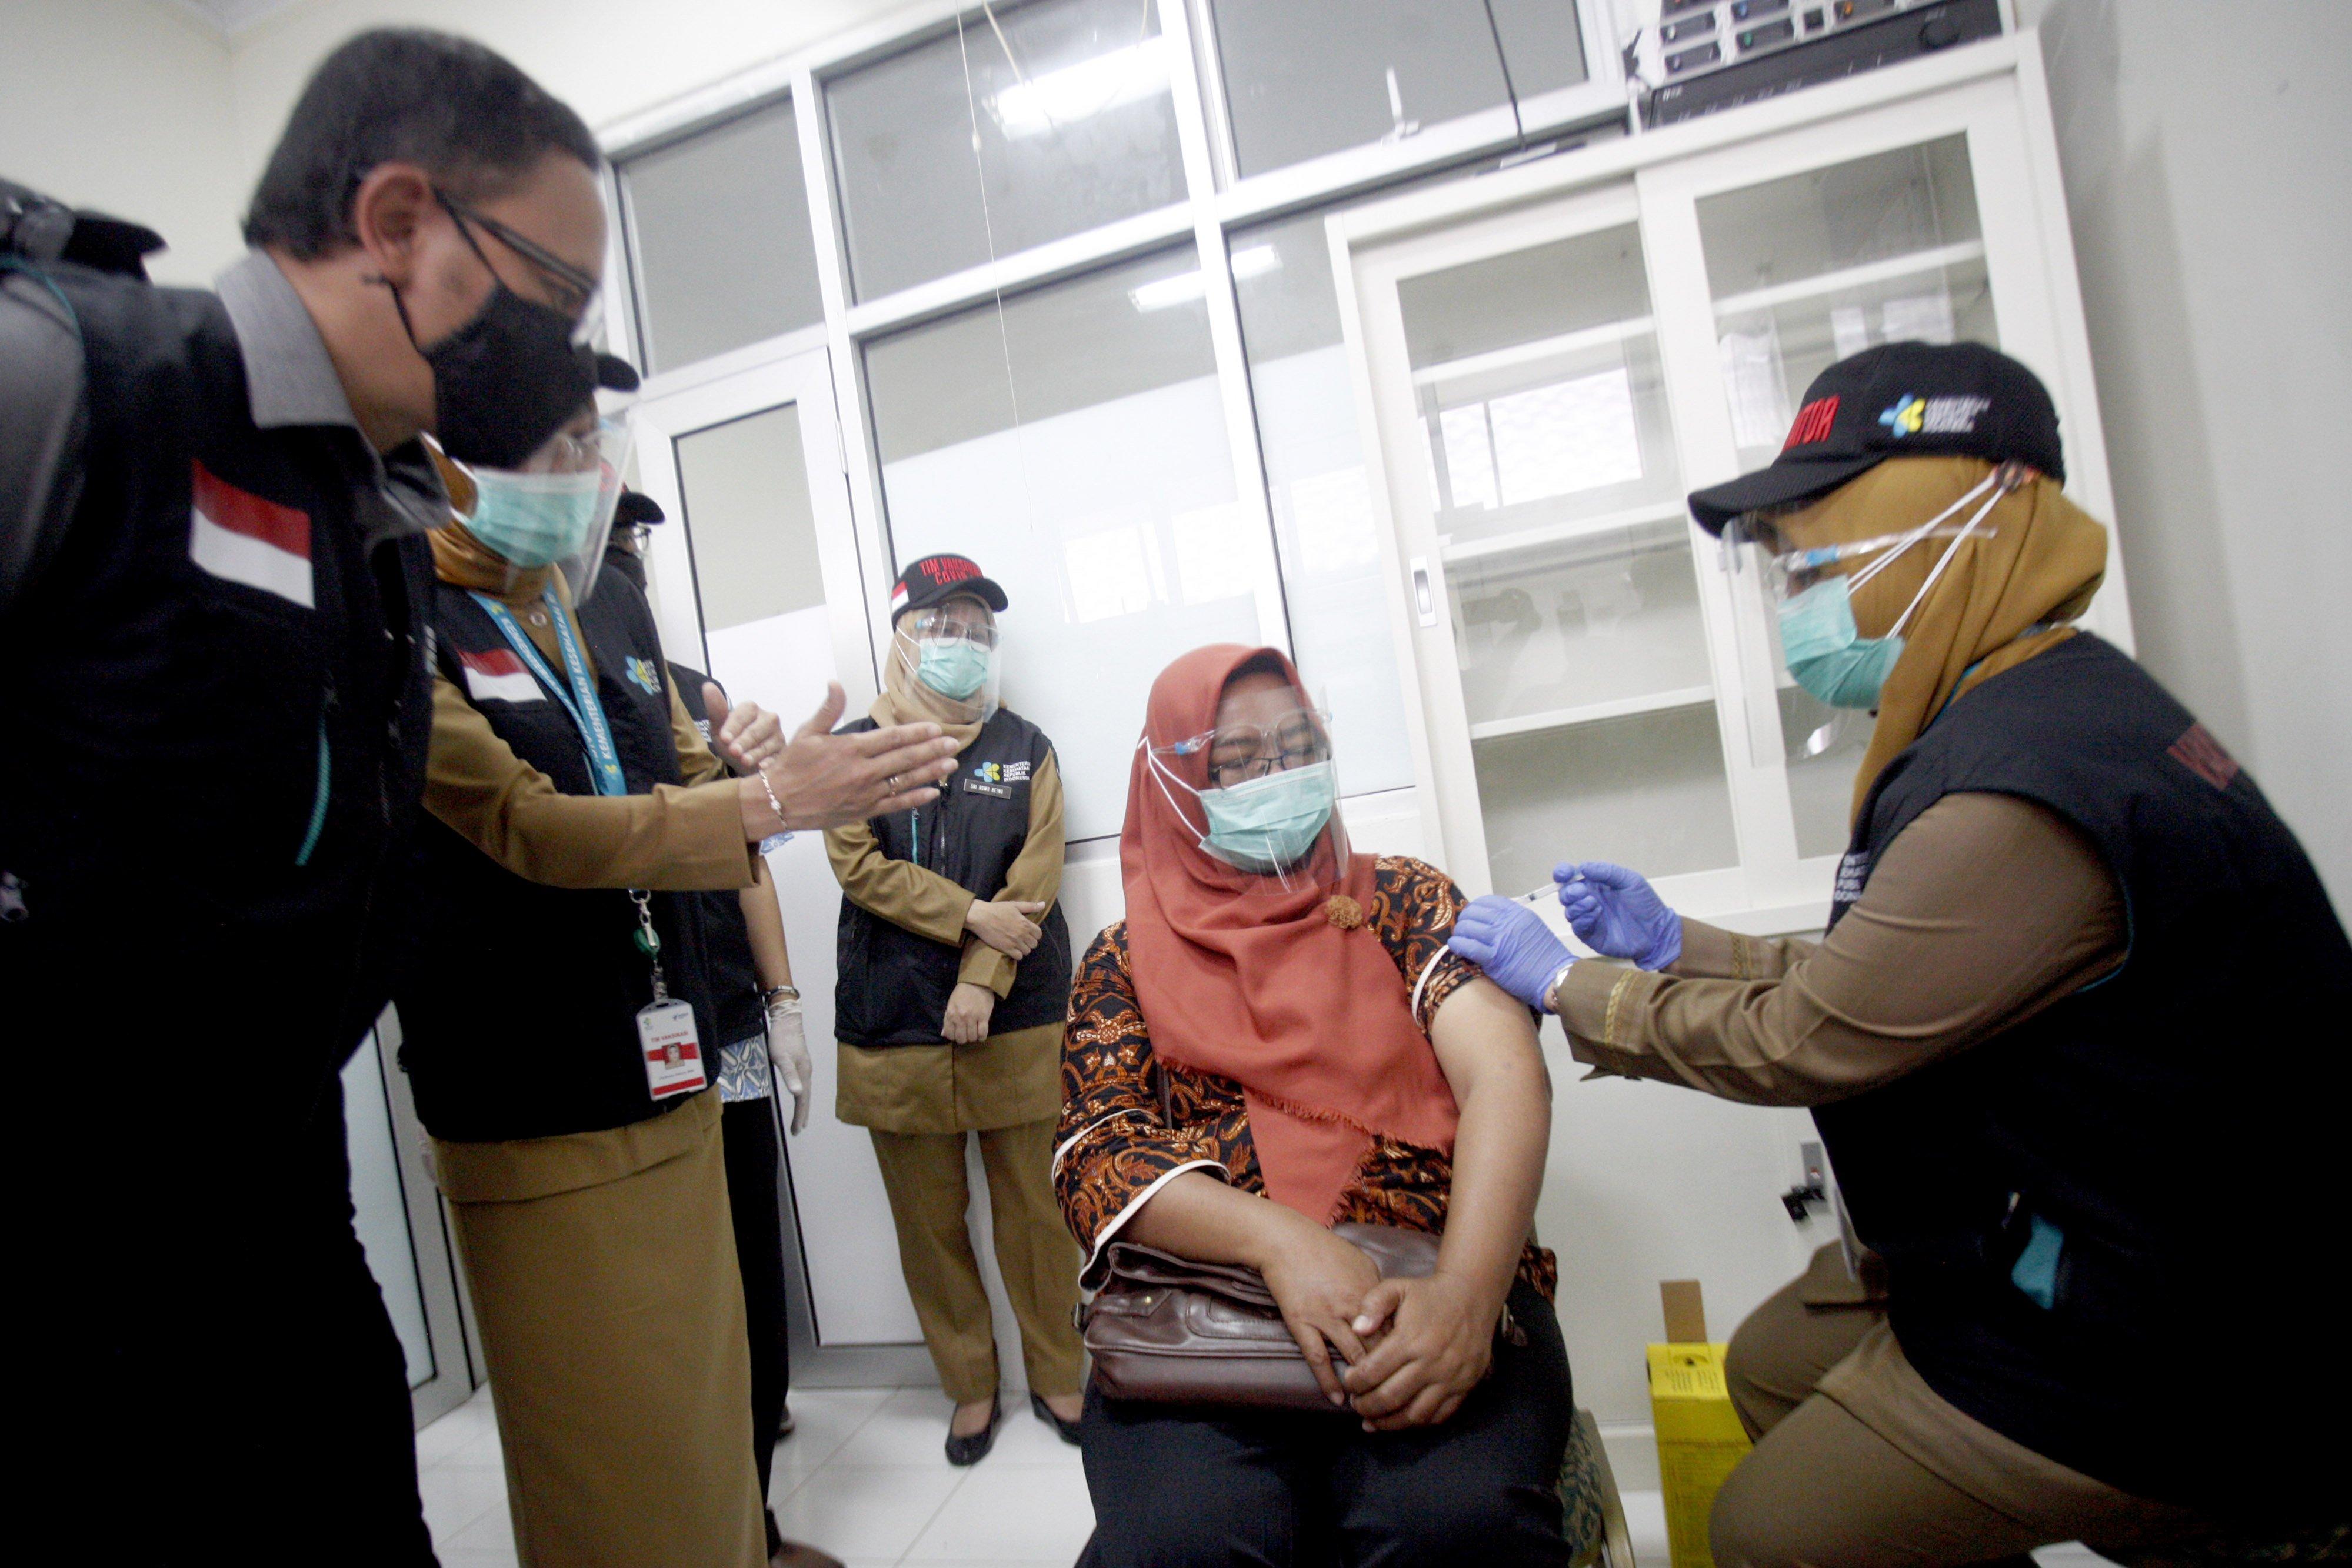 Petugas medis memberikan vaksin COVID-19 disaksikan Wali Kota Bogor Bima Arya (kiri) pada simulasi vaksinasi COVID-19 di Puskesamas Tanah Sareal, Kota Bogor, Jawa Barat, Rabu (18/11/2020). Menteri Kesehatan (Menkes) Terawan Agus Putranto mengatakan, pemerintah menargetkan imunisasi COVID-19 akan diberikan kepada 67 persen dari 160 juta penduduk berusia 18-59 tahun atau sebanyak 107,2 juta orang, pemberian vaksinasi akan dilakukan melalui skema vaksin program dan vaksin mandiri.